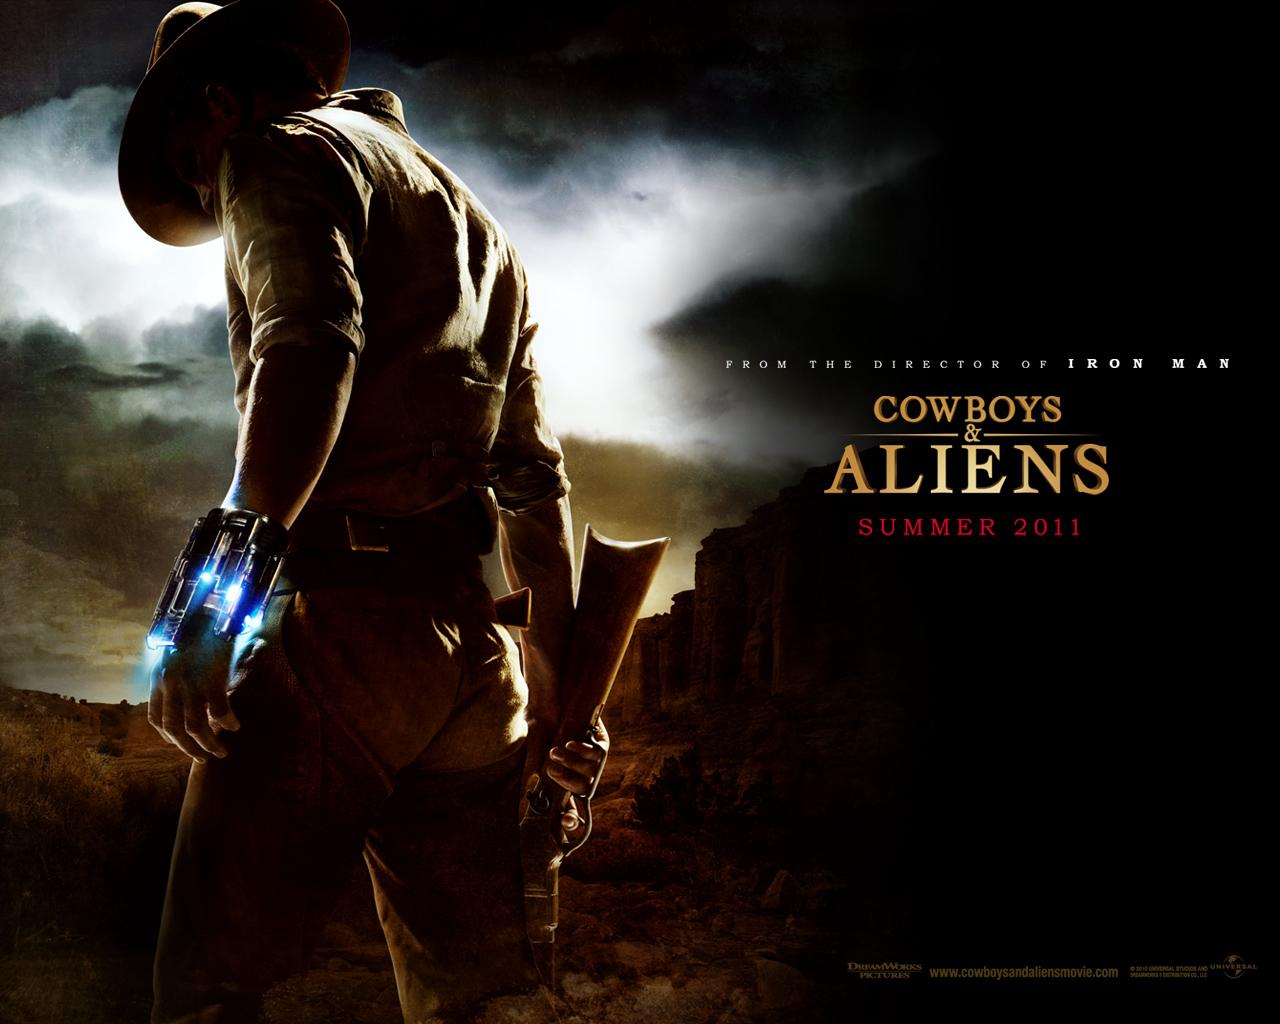 http://3.bp.blogspot.com/-314WFrmU04k/TlPbQk7_wVI/AAAAAAAAAlc/vXcmtwgNV_c/s1600/Daniel_Craig_in_Cowboys_and_Aliens_Wallpaper_1_800.jpg